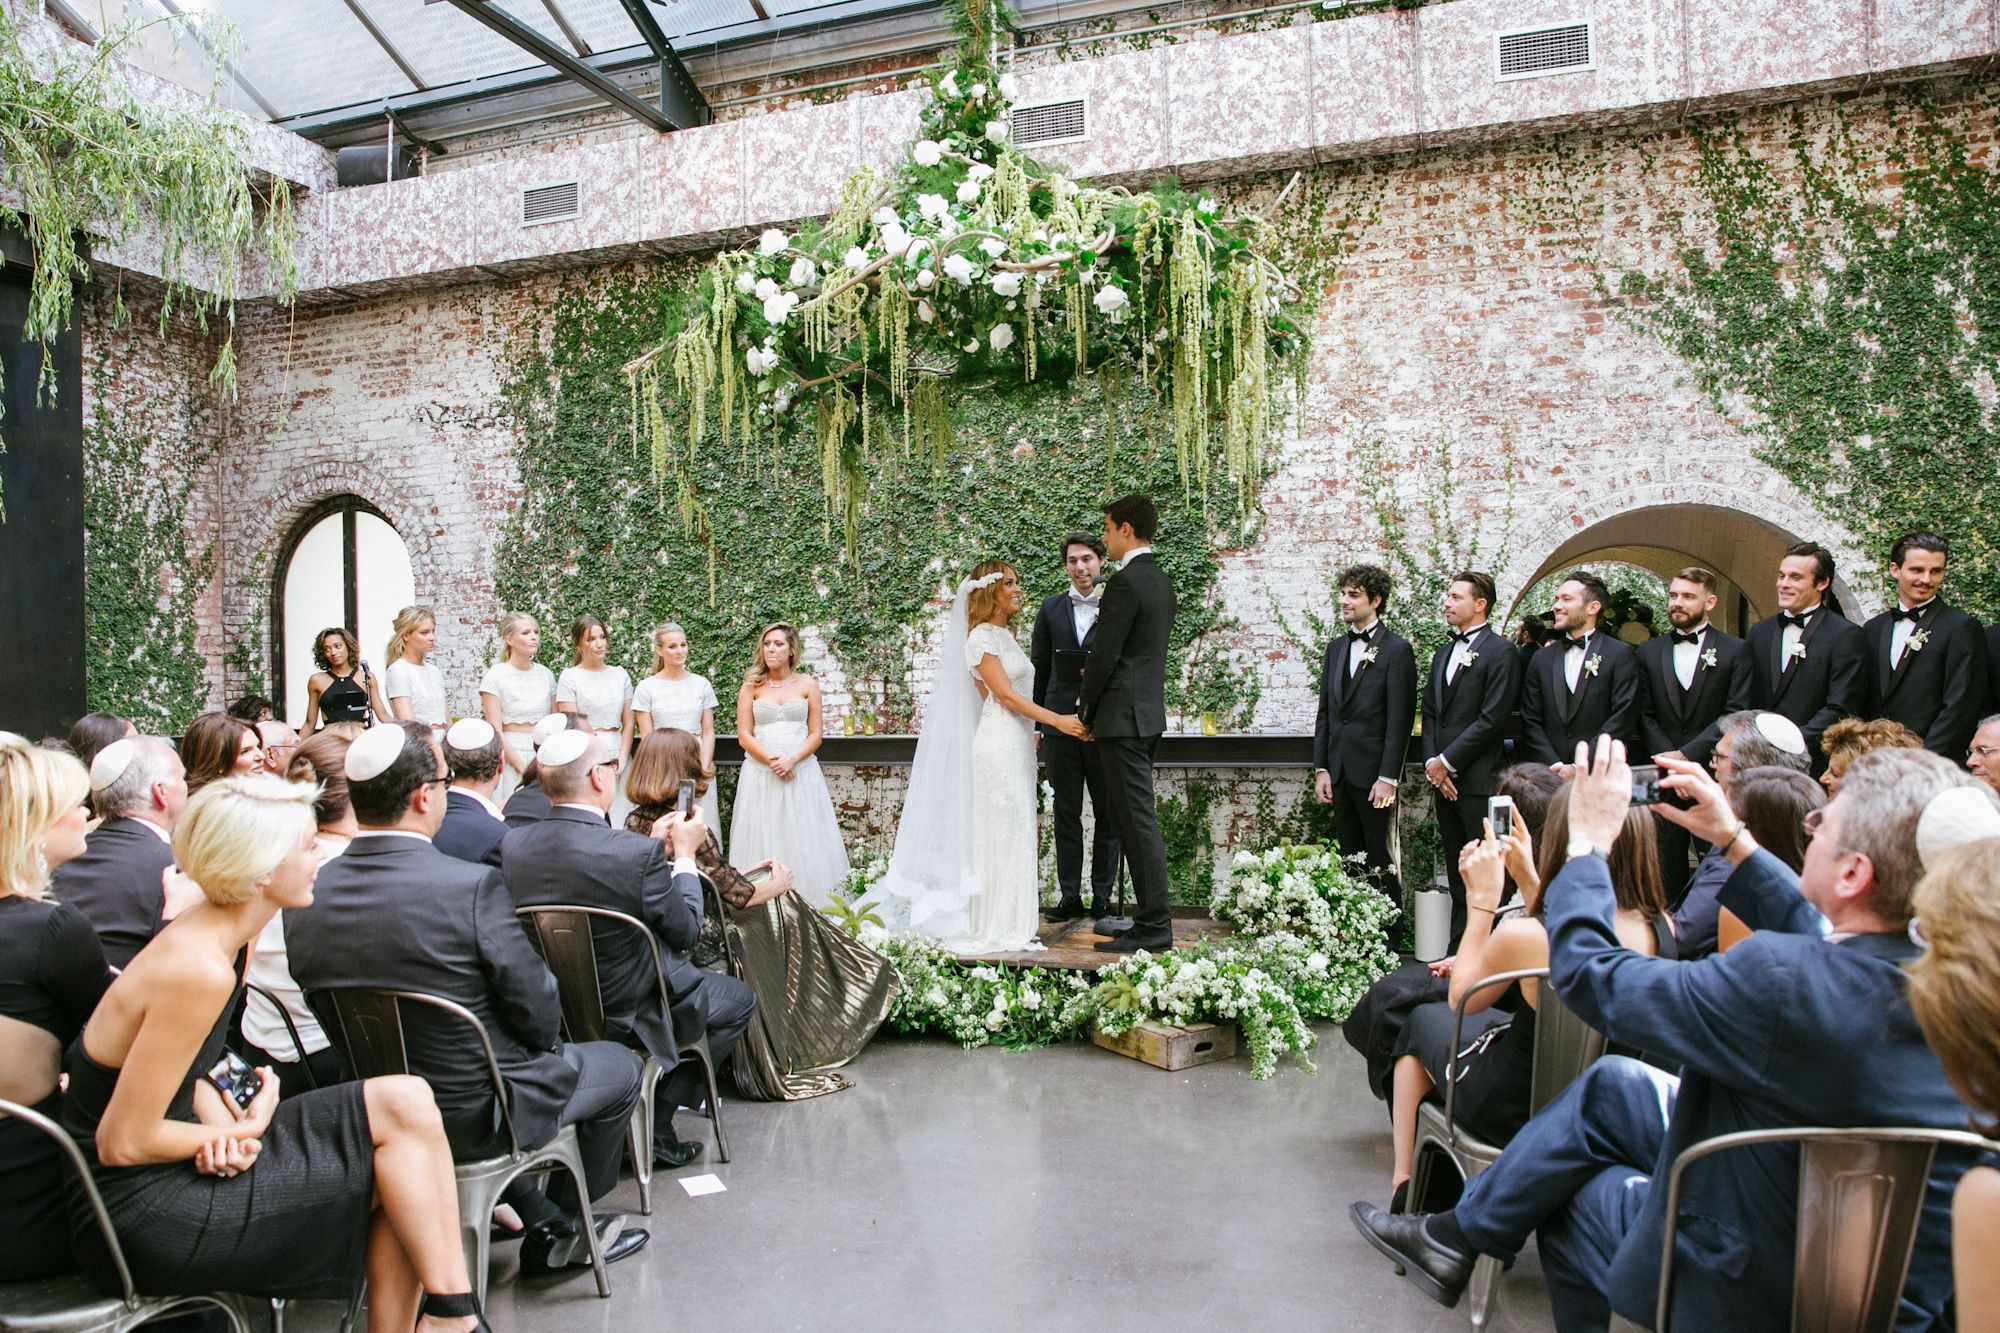 Sasha and Oli Wedding Ceremony Vows Long island city